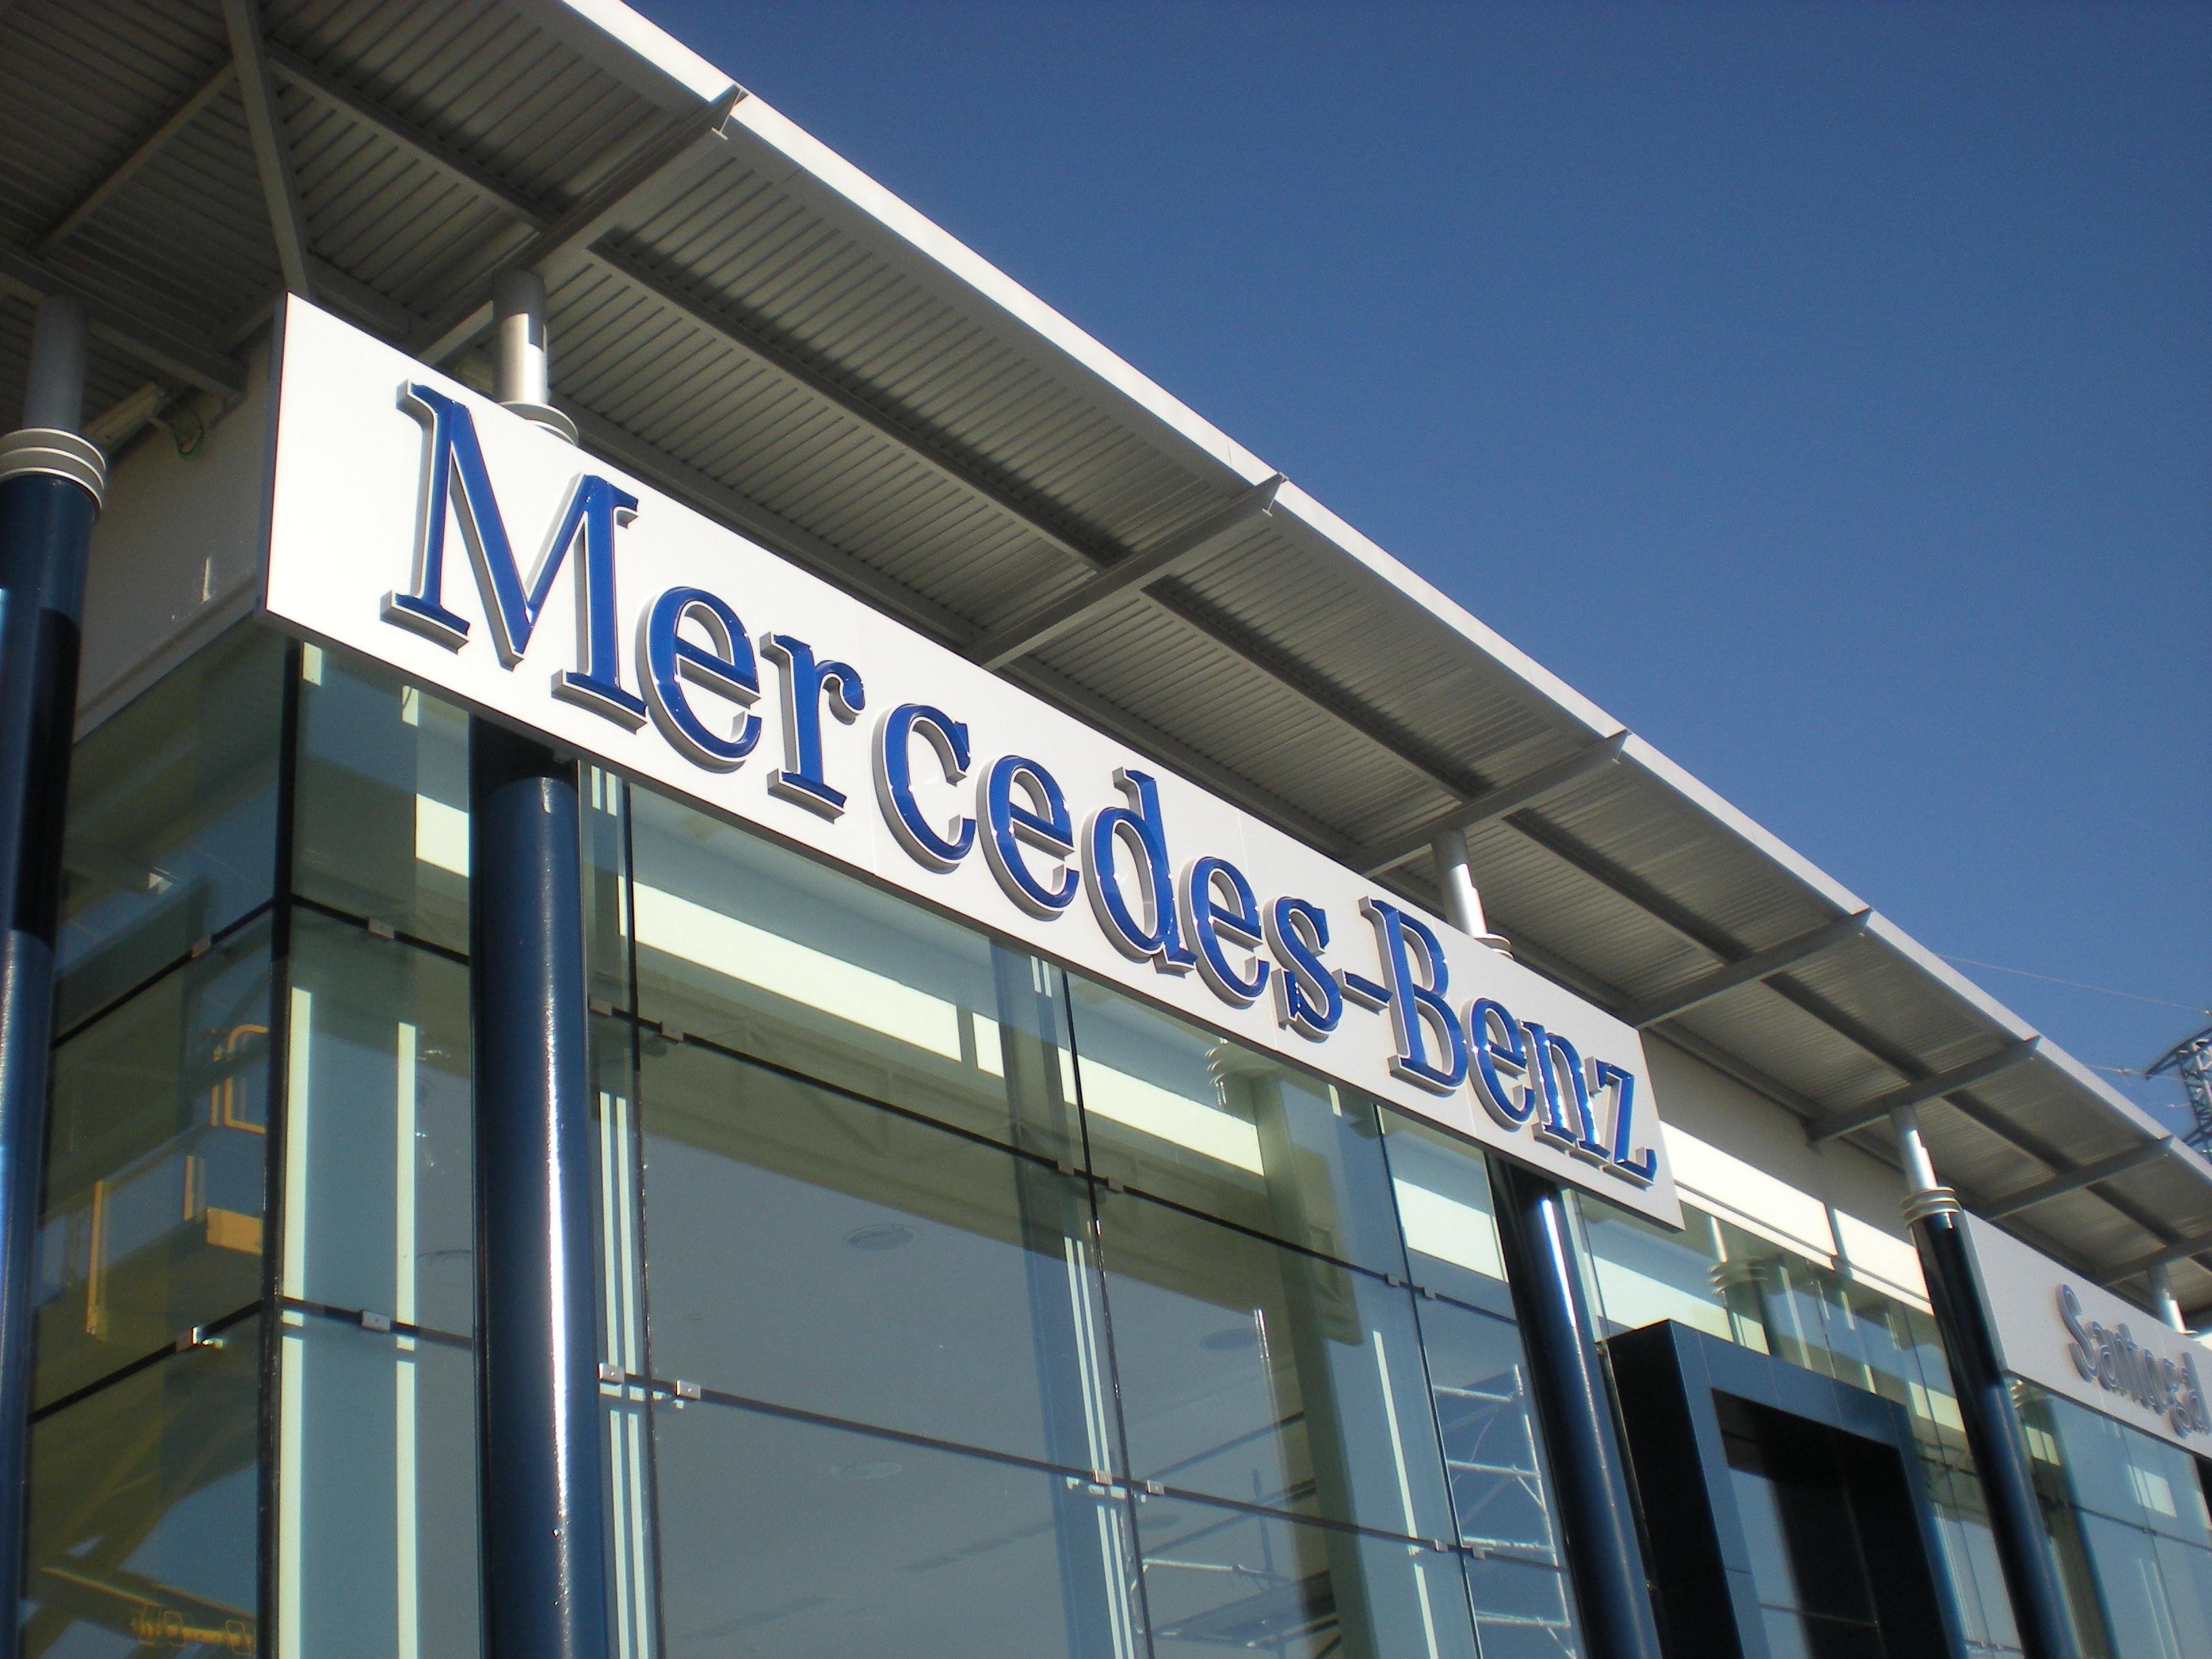 Concesionario Mercedes - Foto: www.tecnosenyal.com